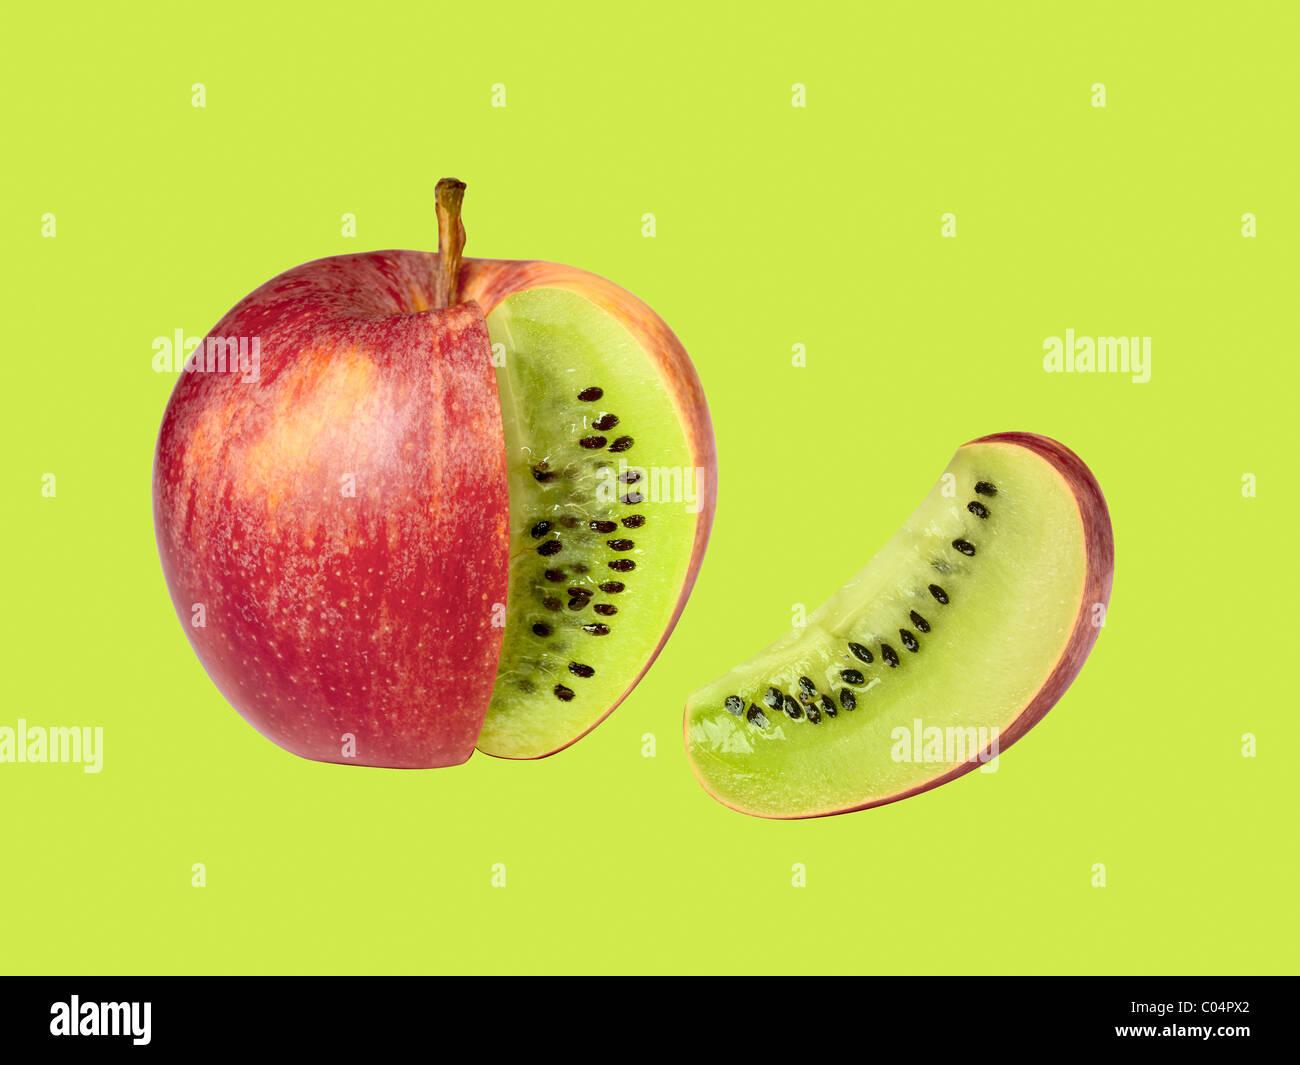 transgene Apfel Kiwi auf grünem Hintergrund isoliert Stockbild